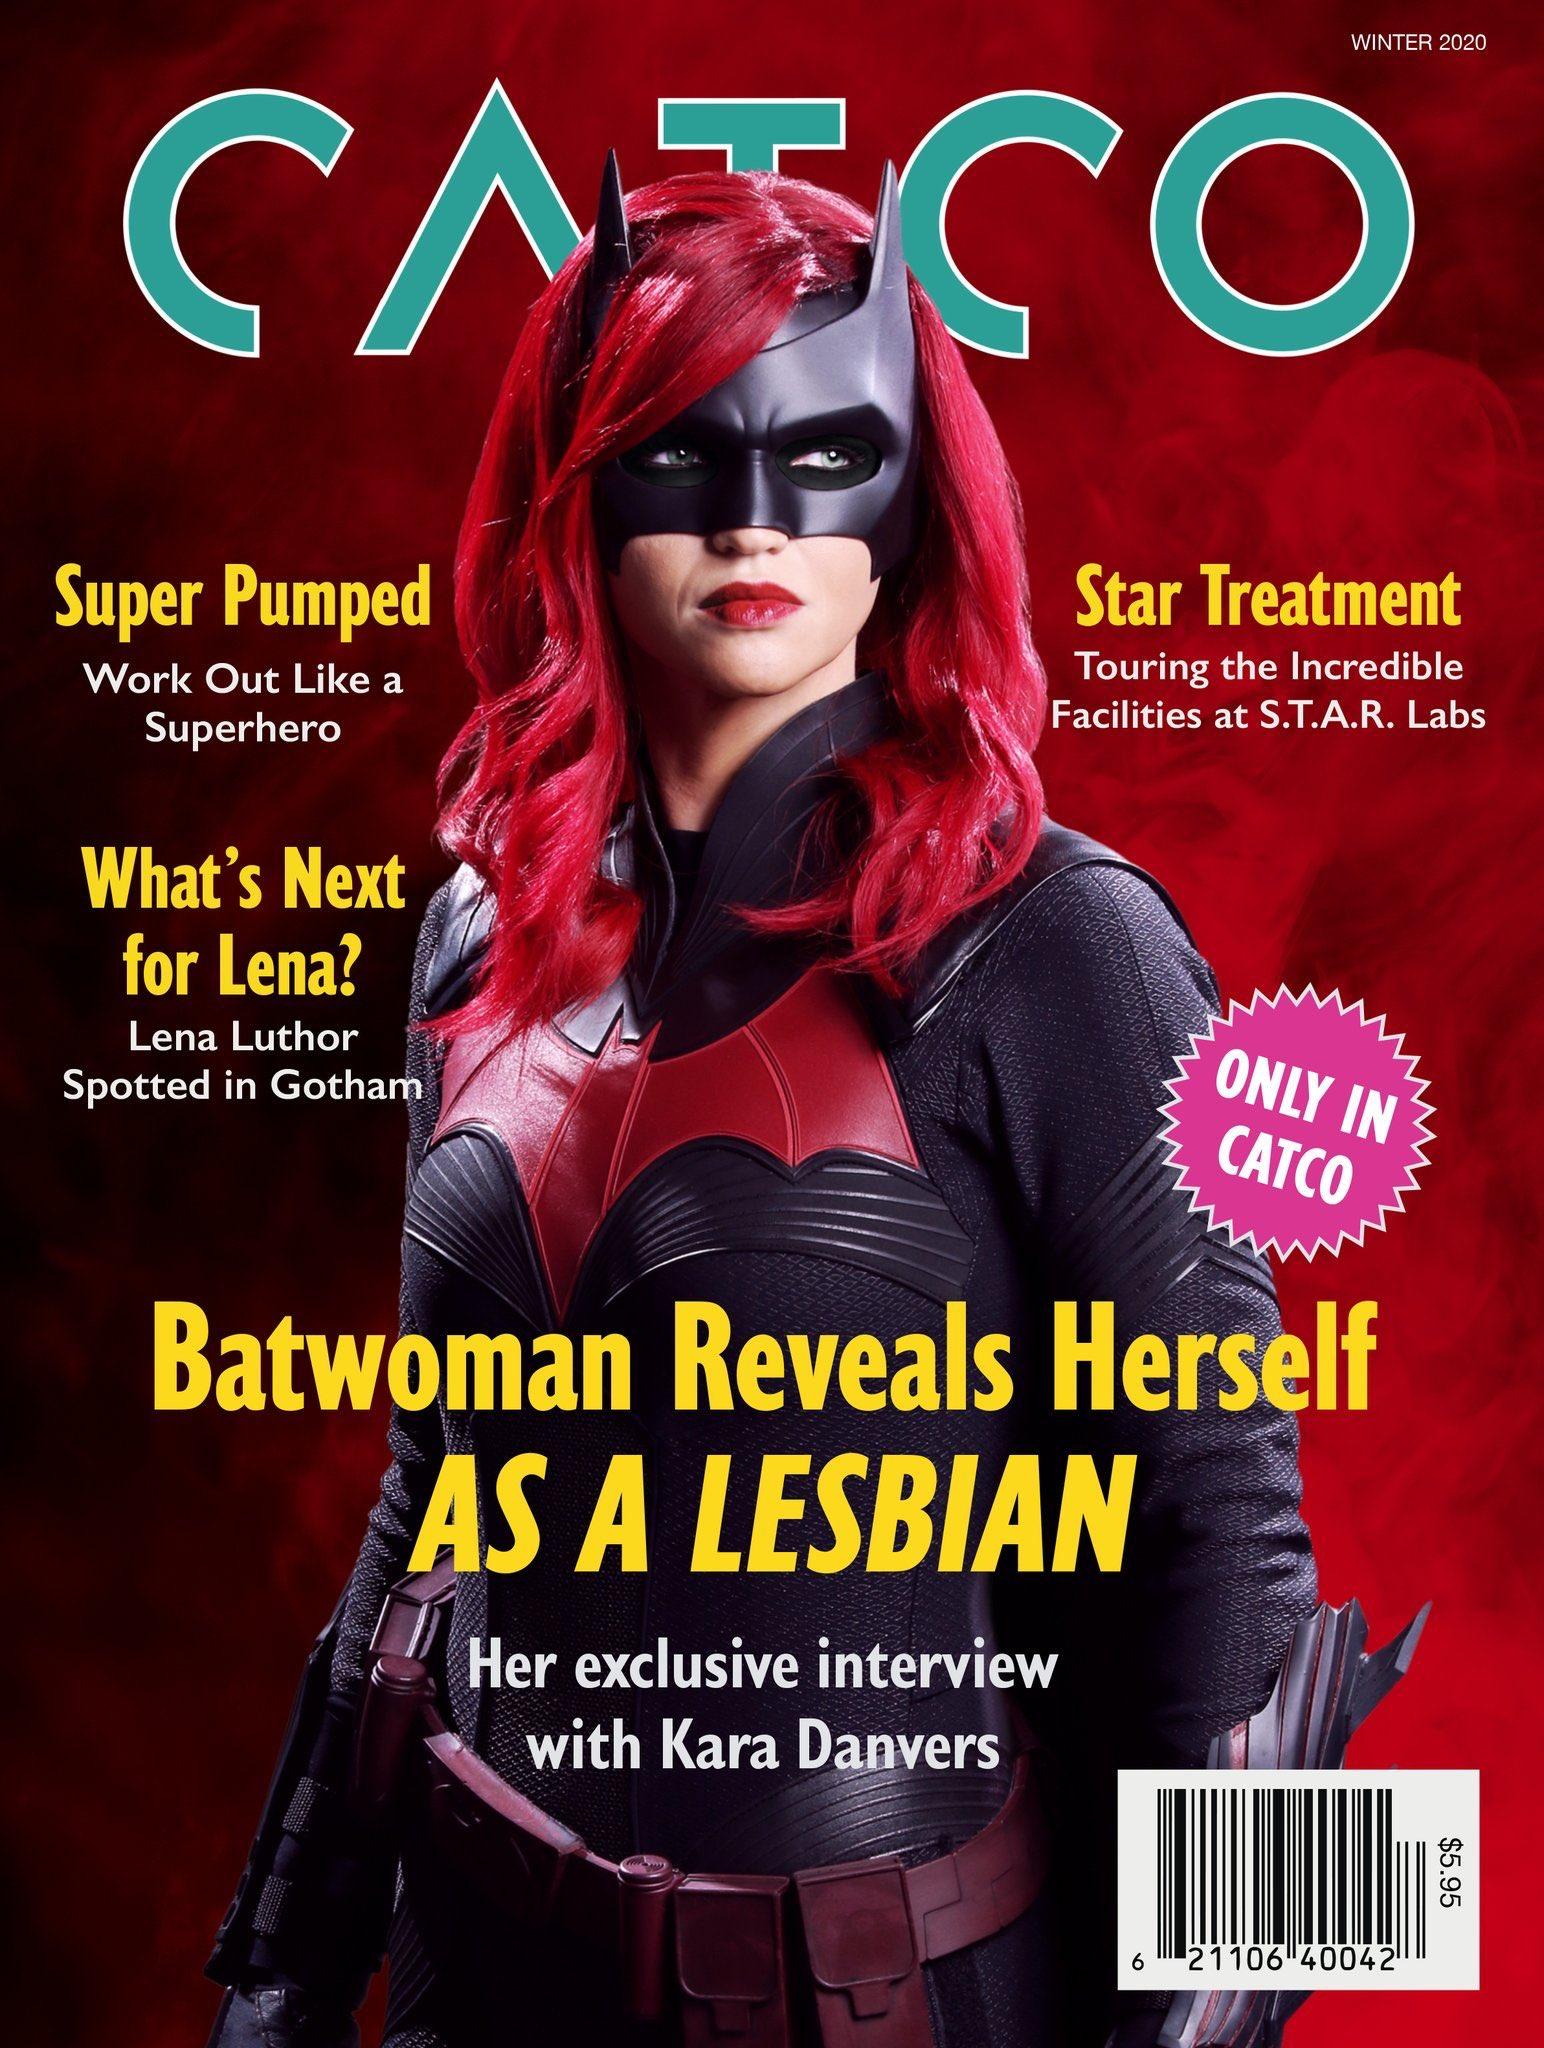 Batwoman CatCo Magazine